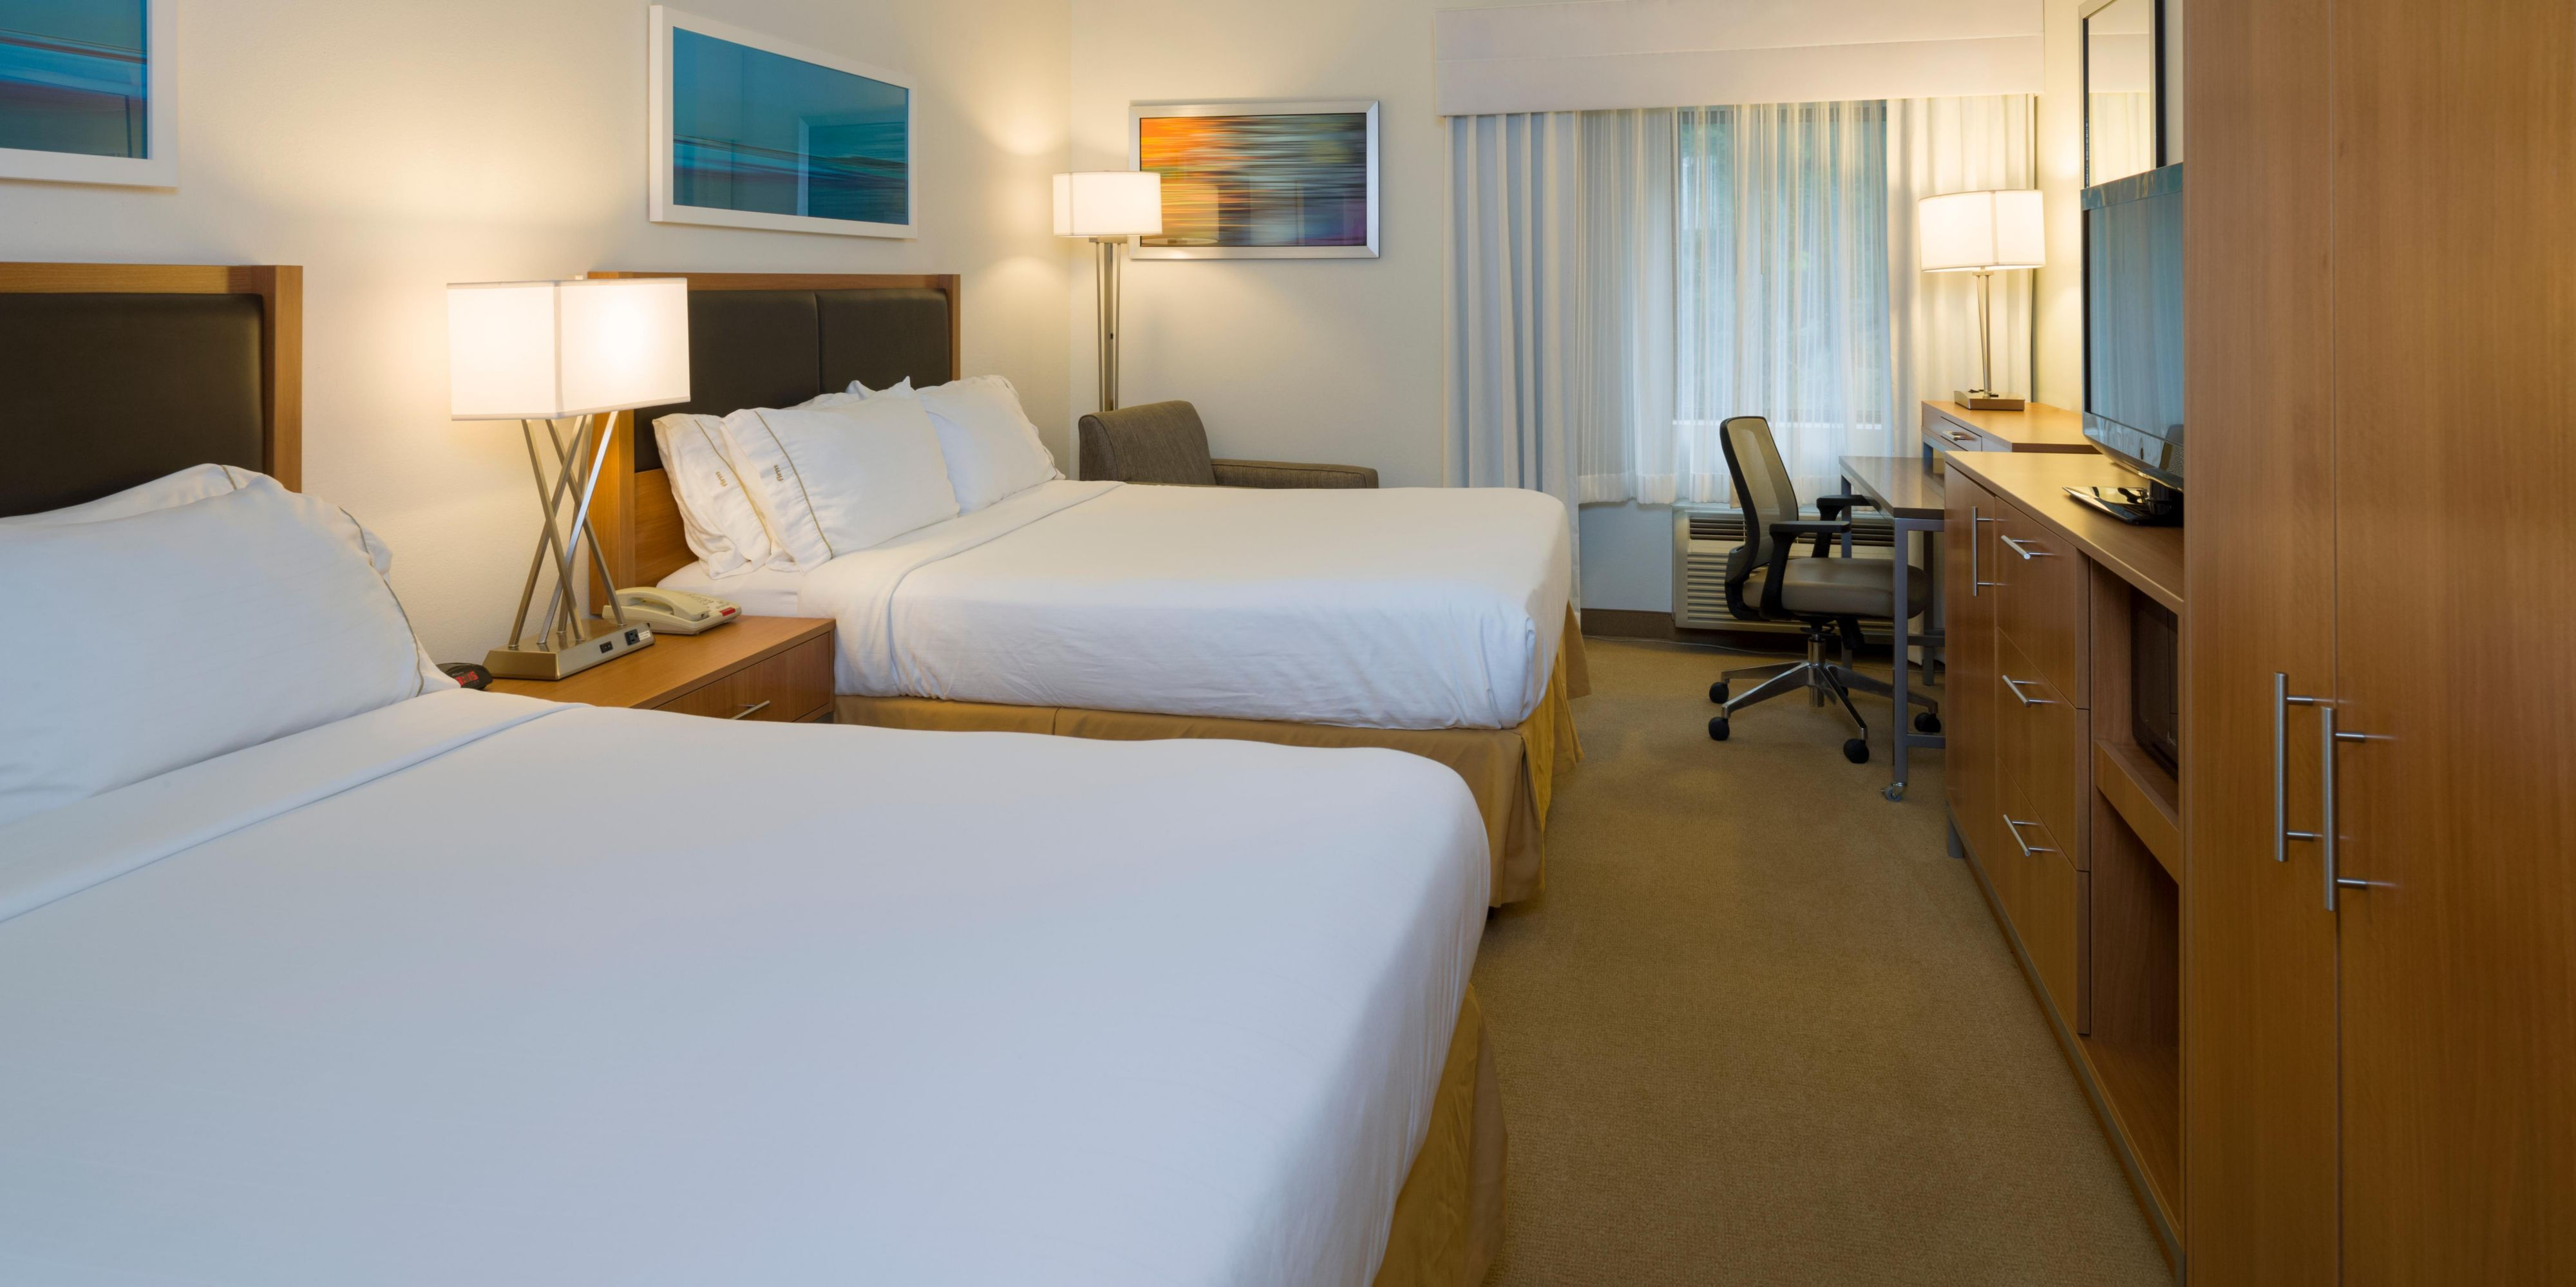 Holiday Inn Express Hershey (Harrisburg Area) Hotel by IHG